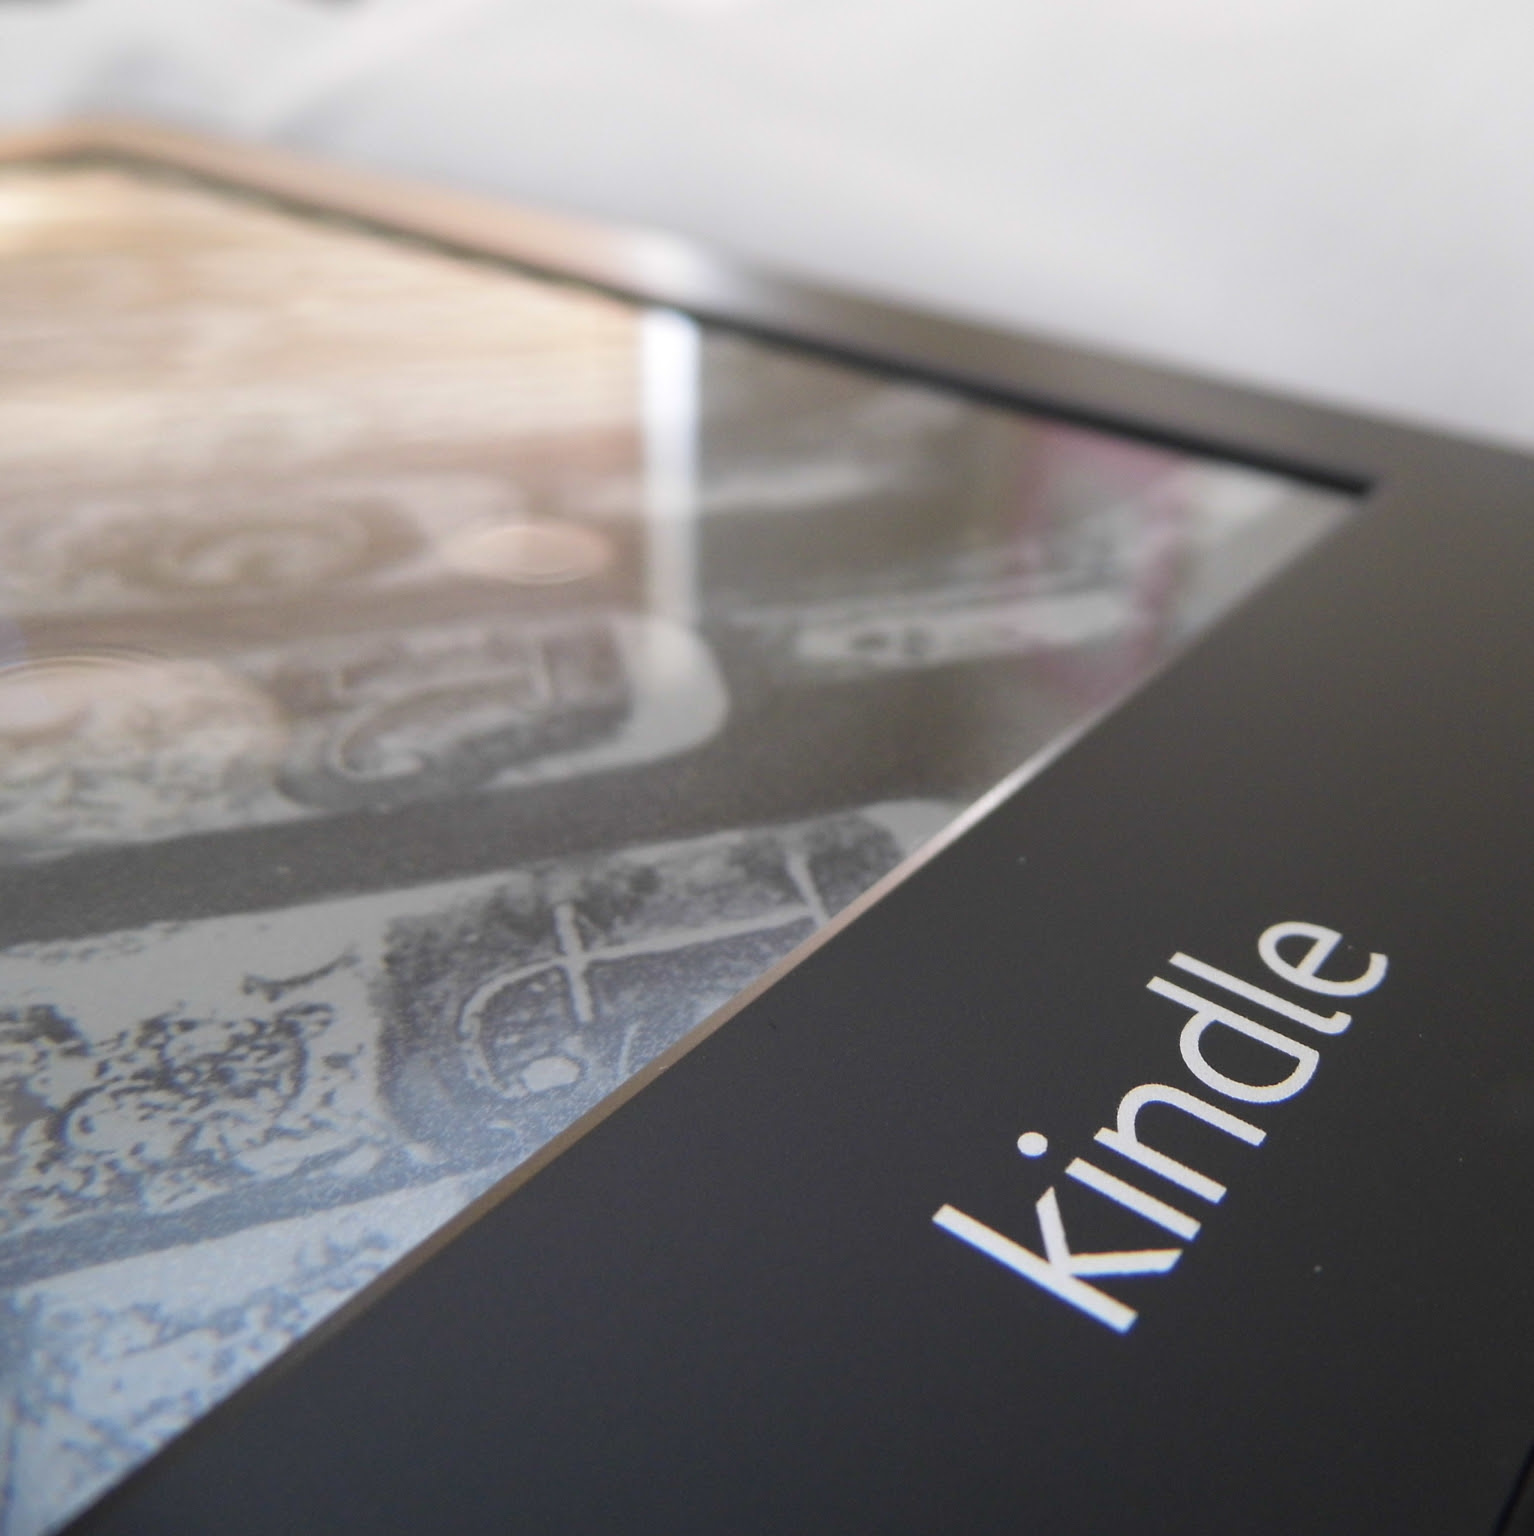 Kindle PaperWhite Close